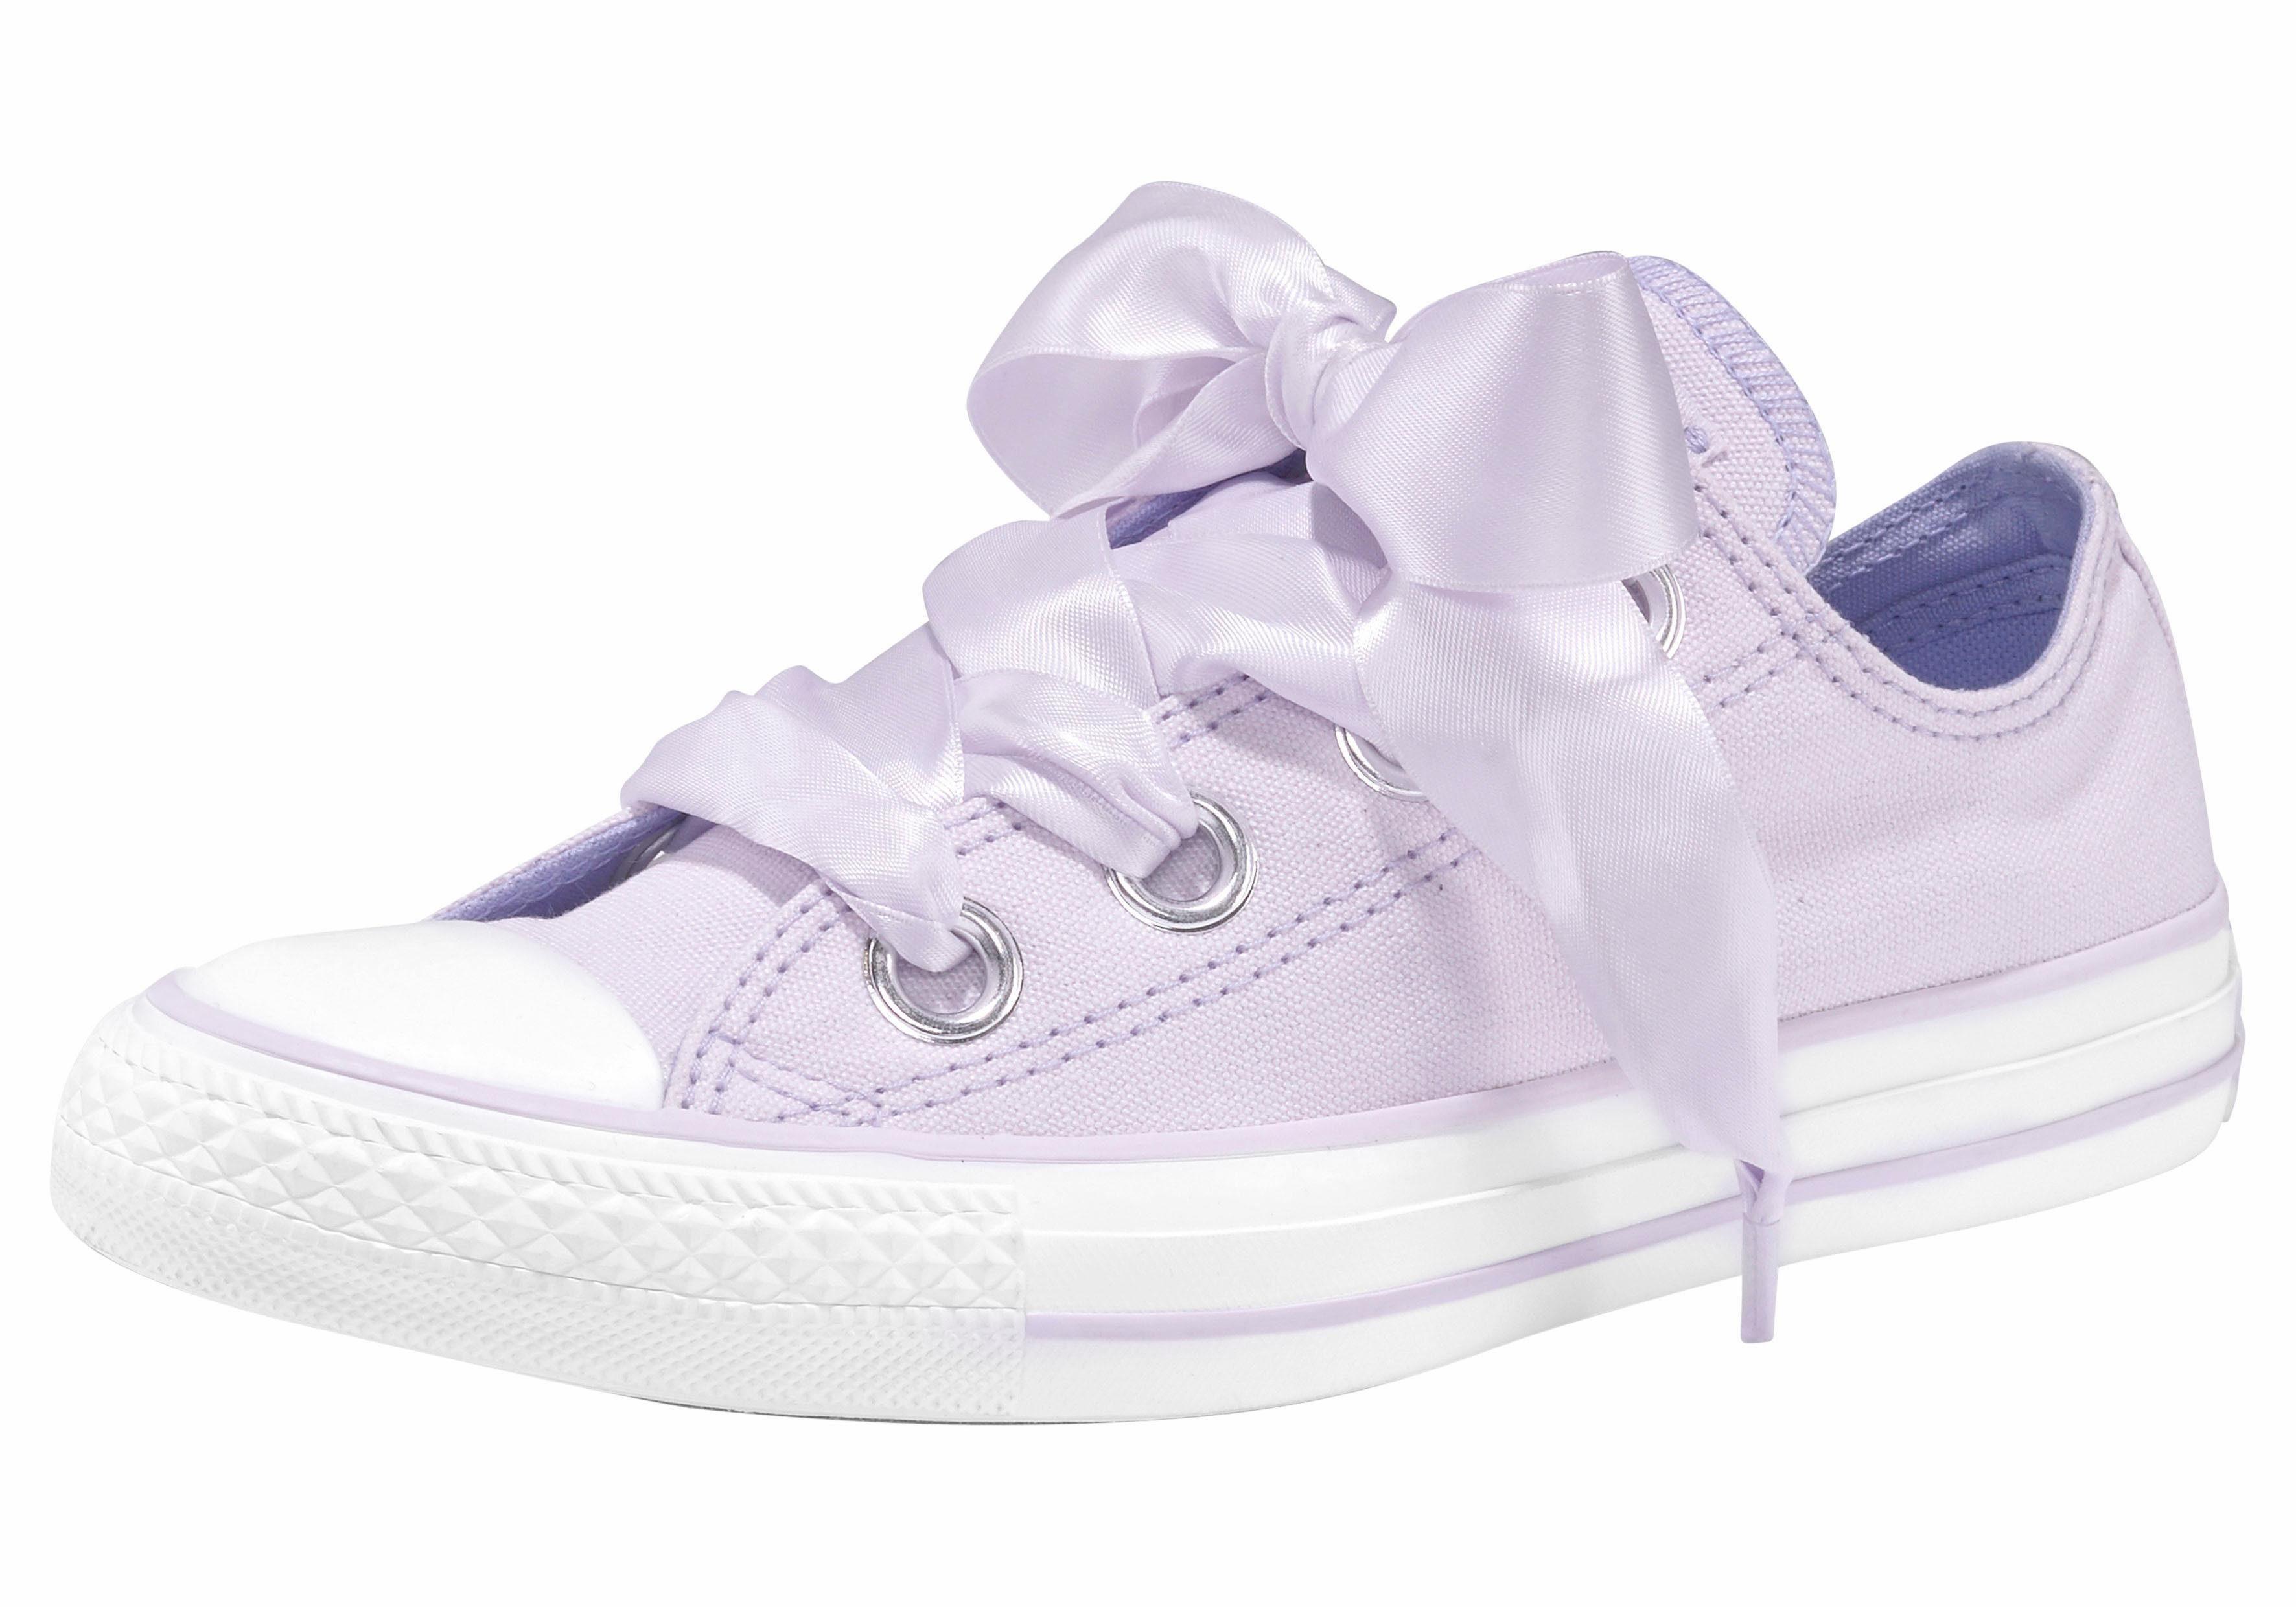 Converse »Chuck Taylor All Star Ox Big Eyelet« Sneaker online kaufen | OTTO